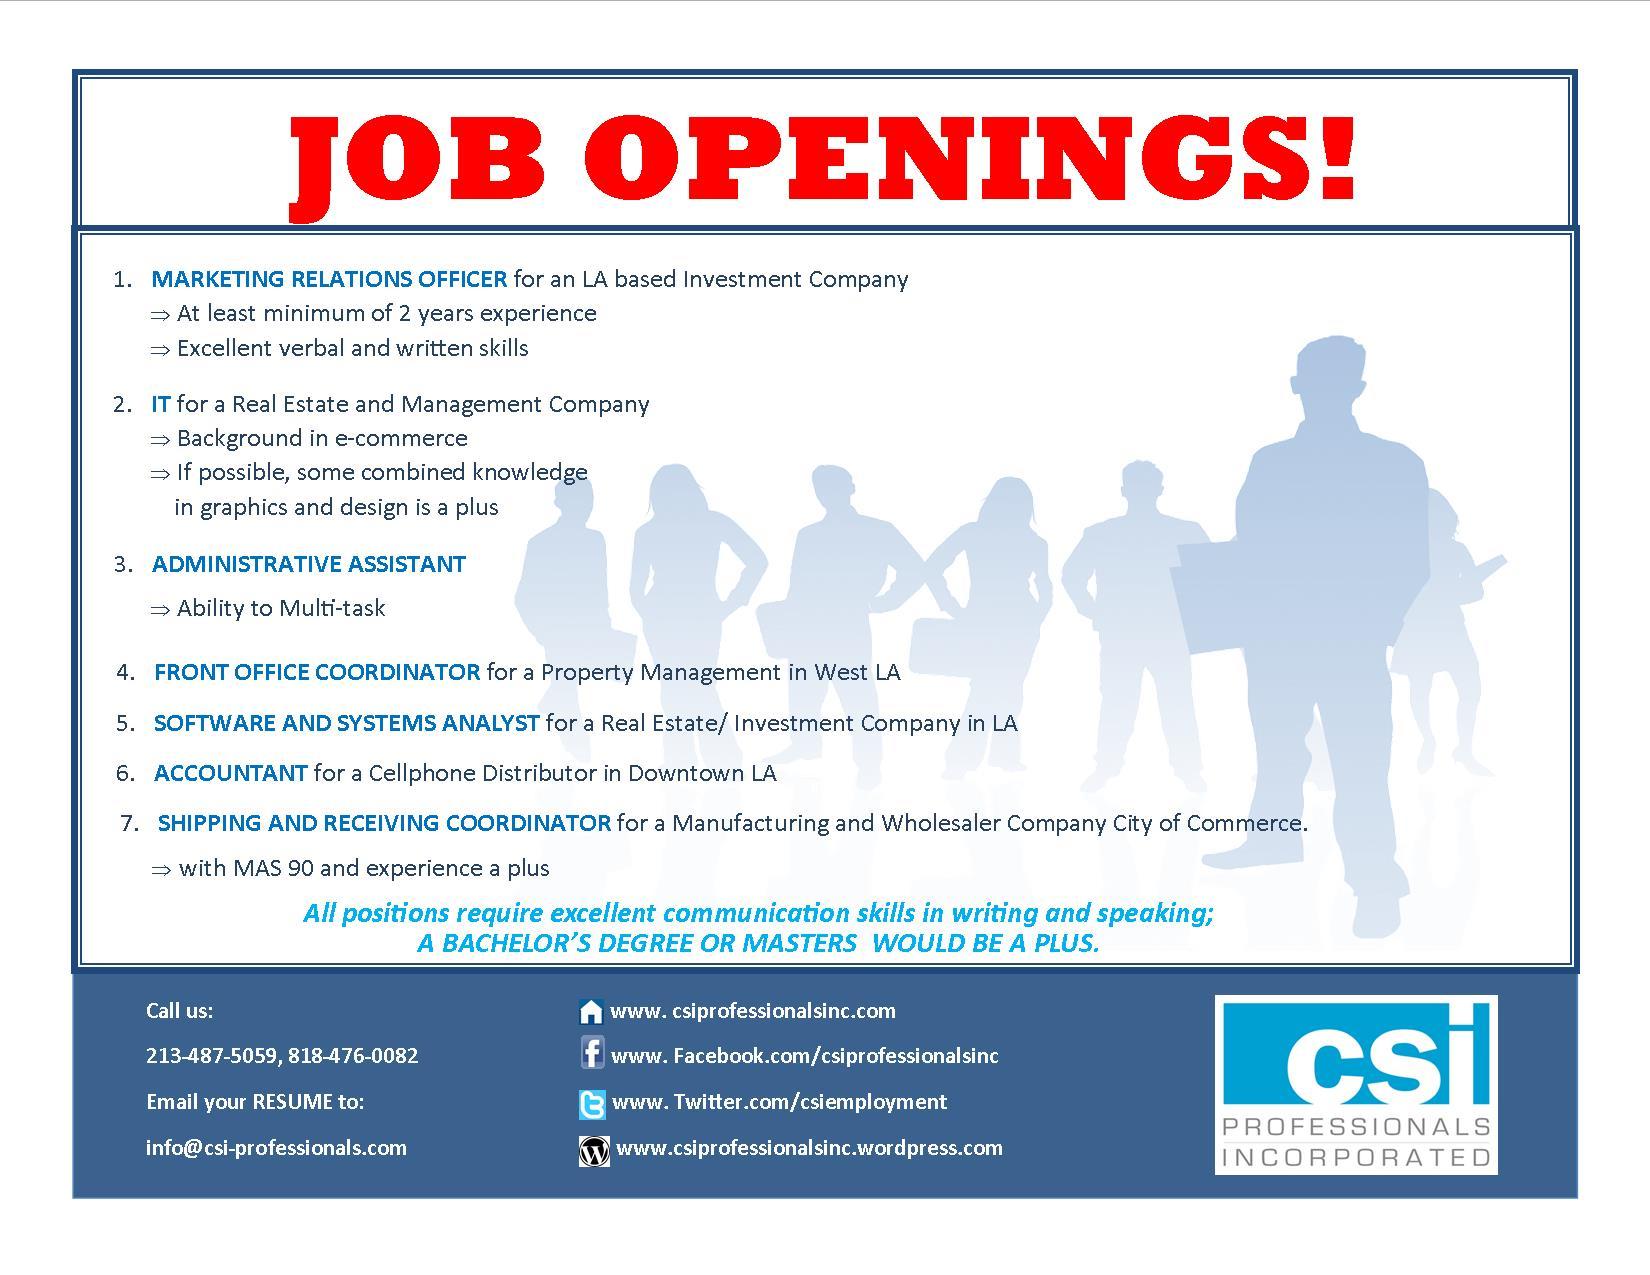 Job openings post.jpg